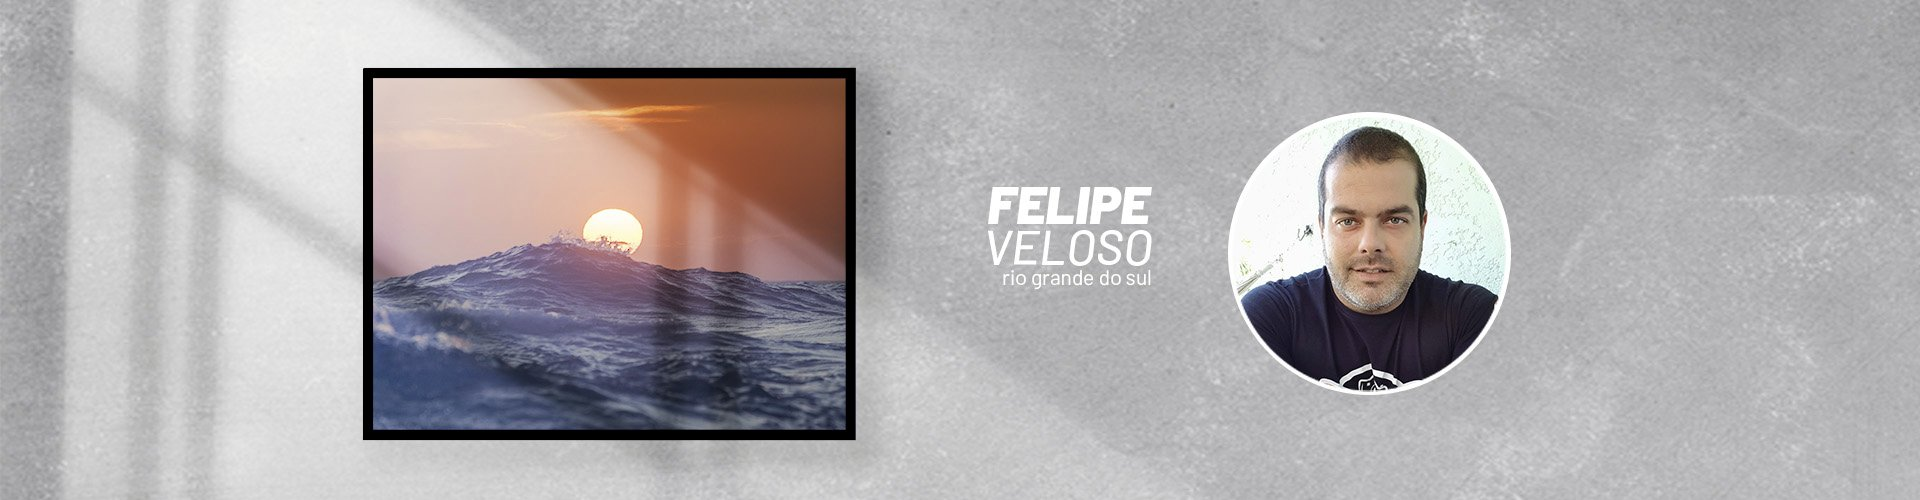 Página Artista | Felipe Veloso